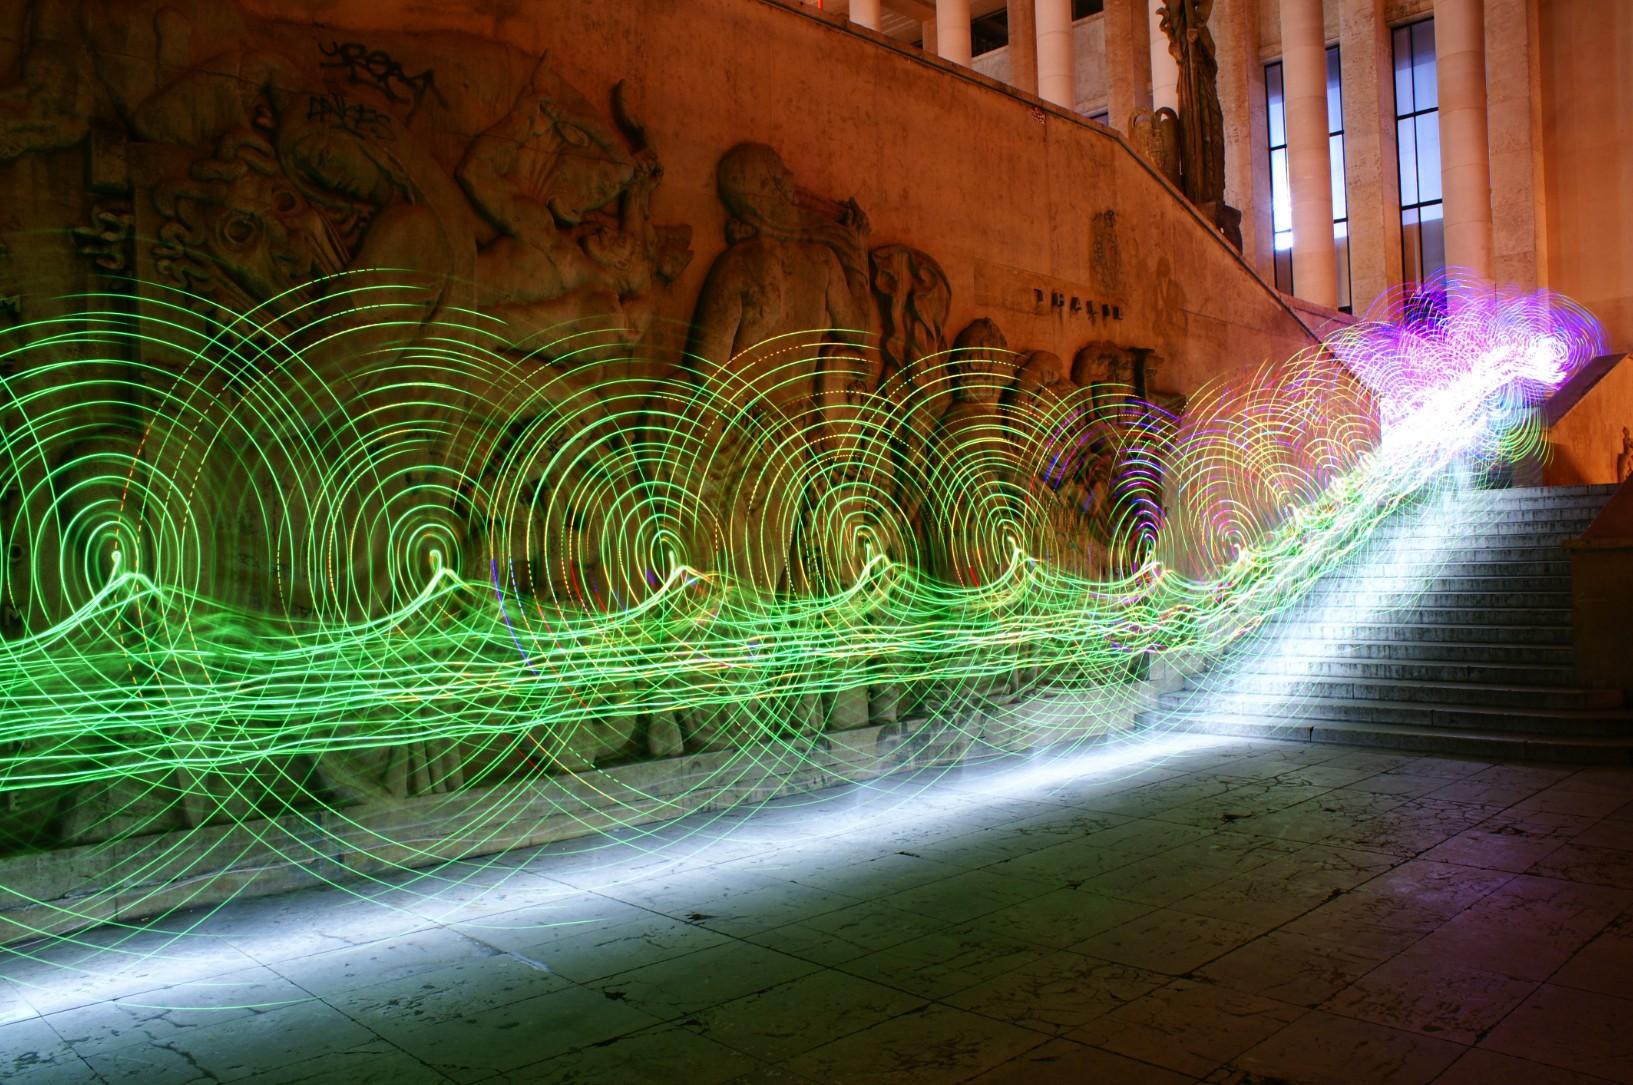 German Lightpainting at the Palais de Tokyo